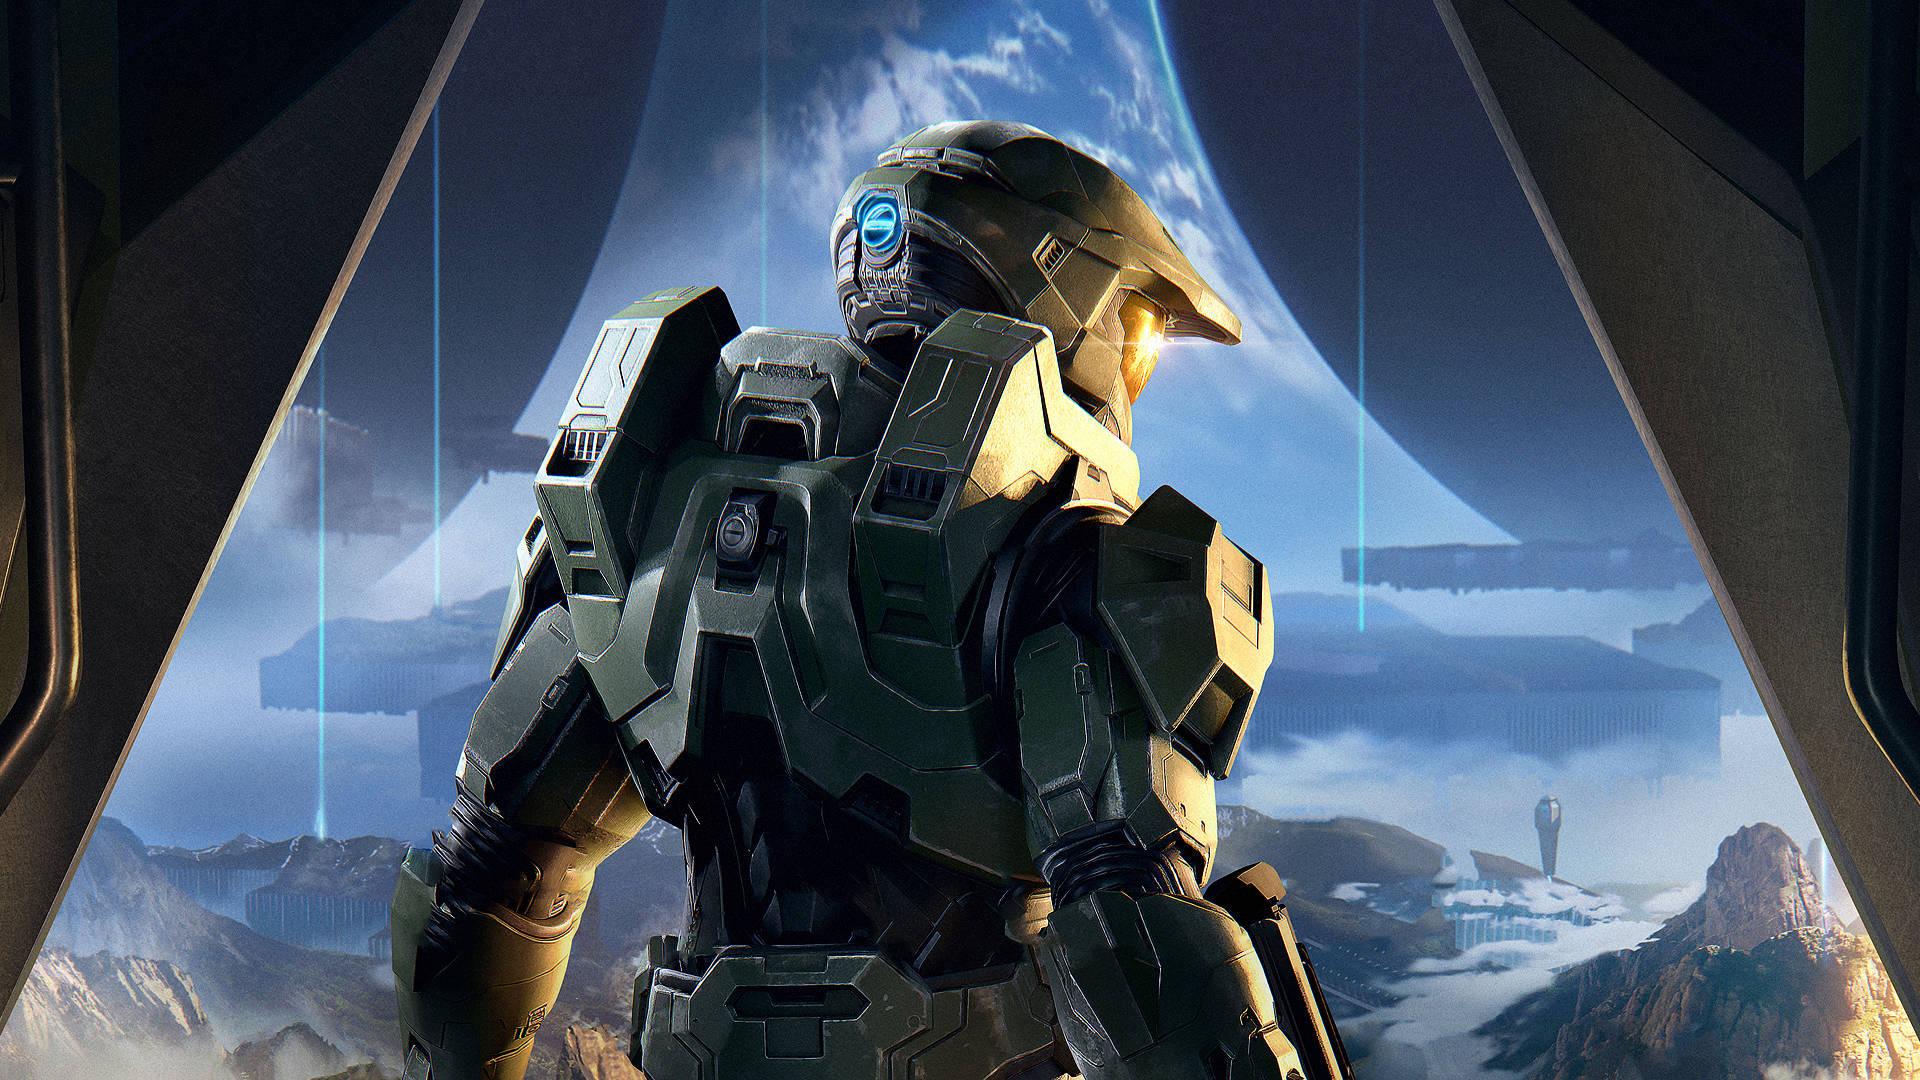 Разработчики Halo Infinite опровергли слухи опереносе игры на2022 год